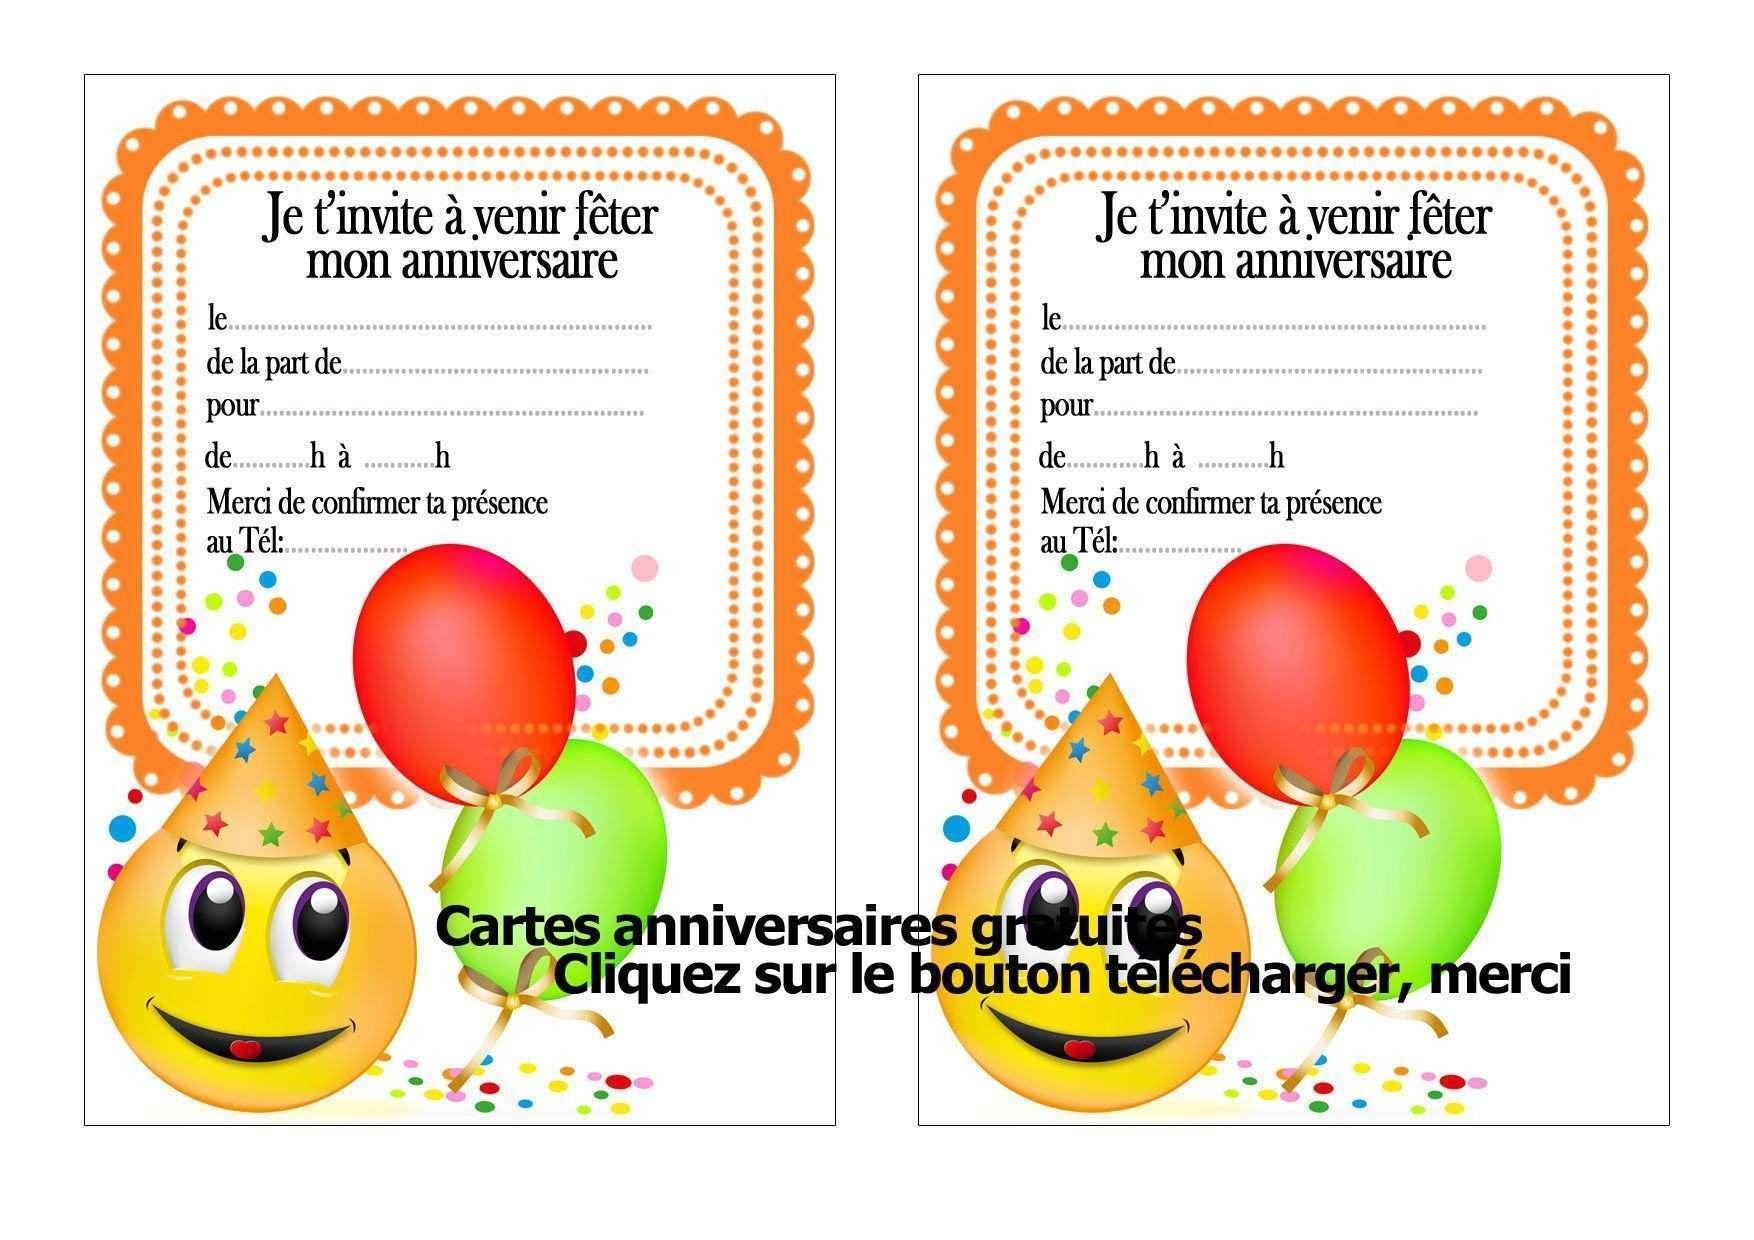 Beautiful Carte Invitation Anniversaire 60 Ans Gratuite A Imprimer | Carte anniversaire gratuite ...